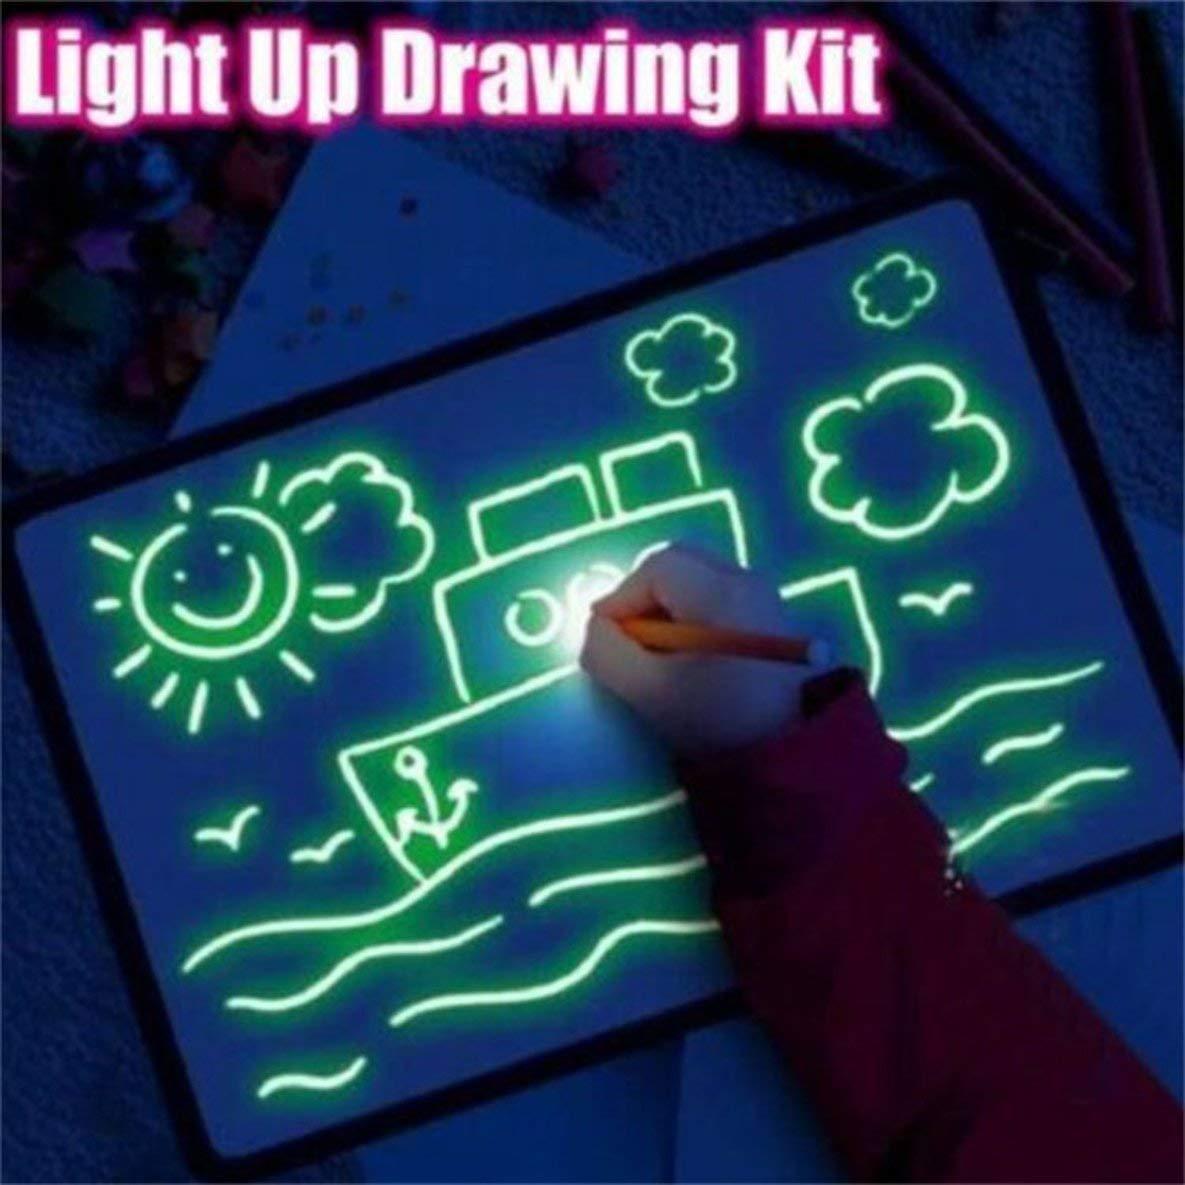 Draw With Light Fun Tablero de dibujo Tablero luminoso Tablero de dibujo para ni/ños Magic Glowing Magic Graffiti Tablero de dibujo para ni/ños//Multicolor//150x20x21